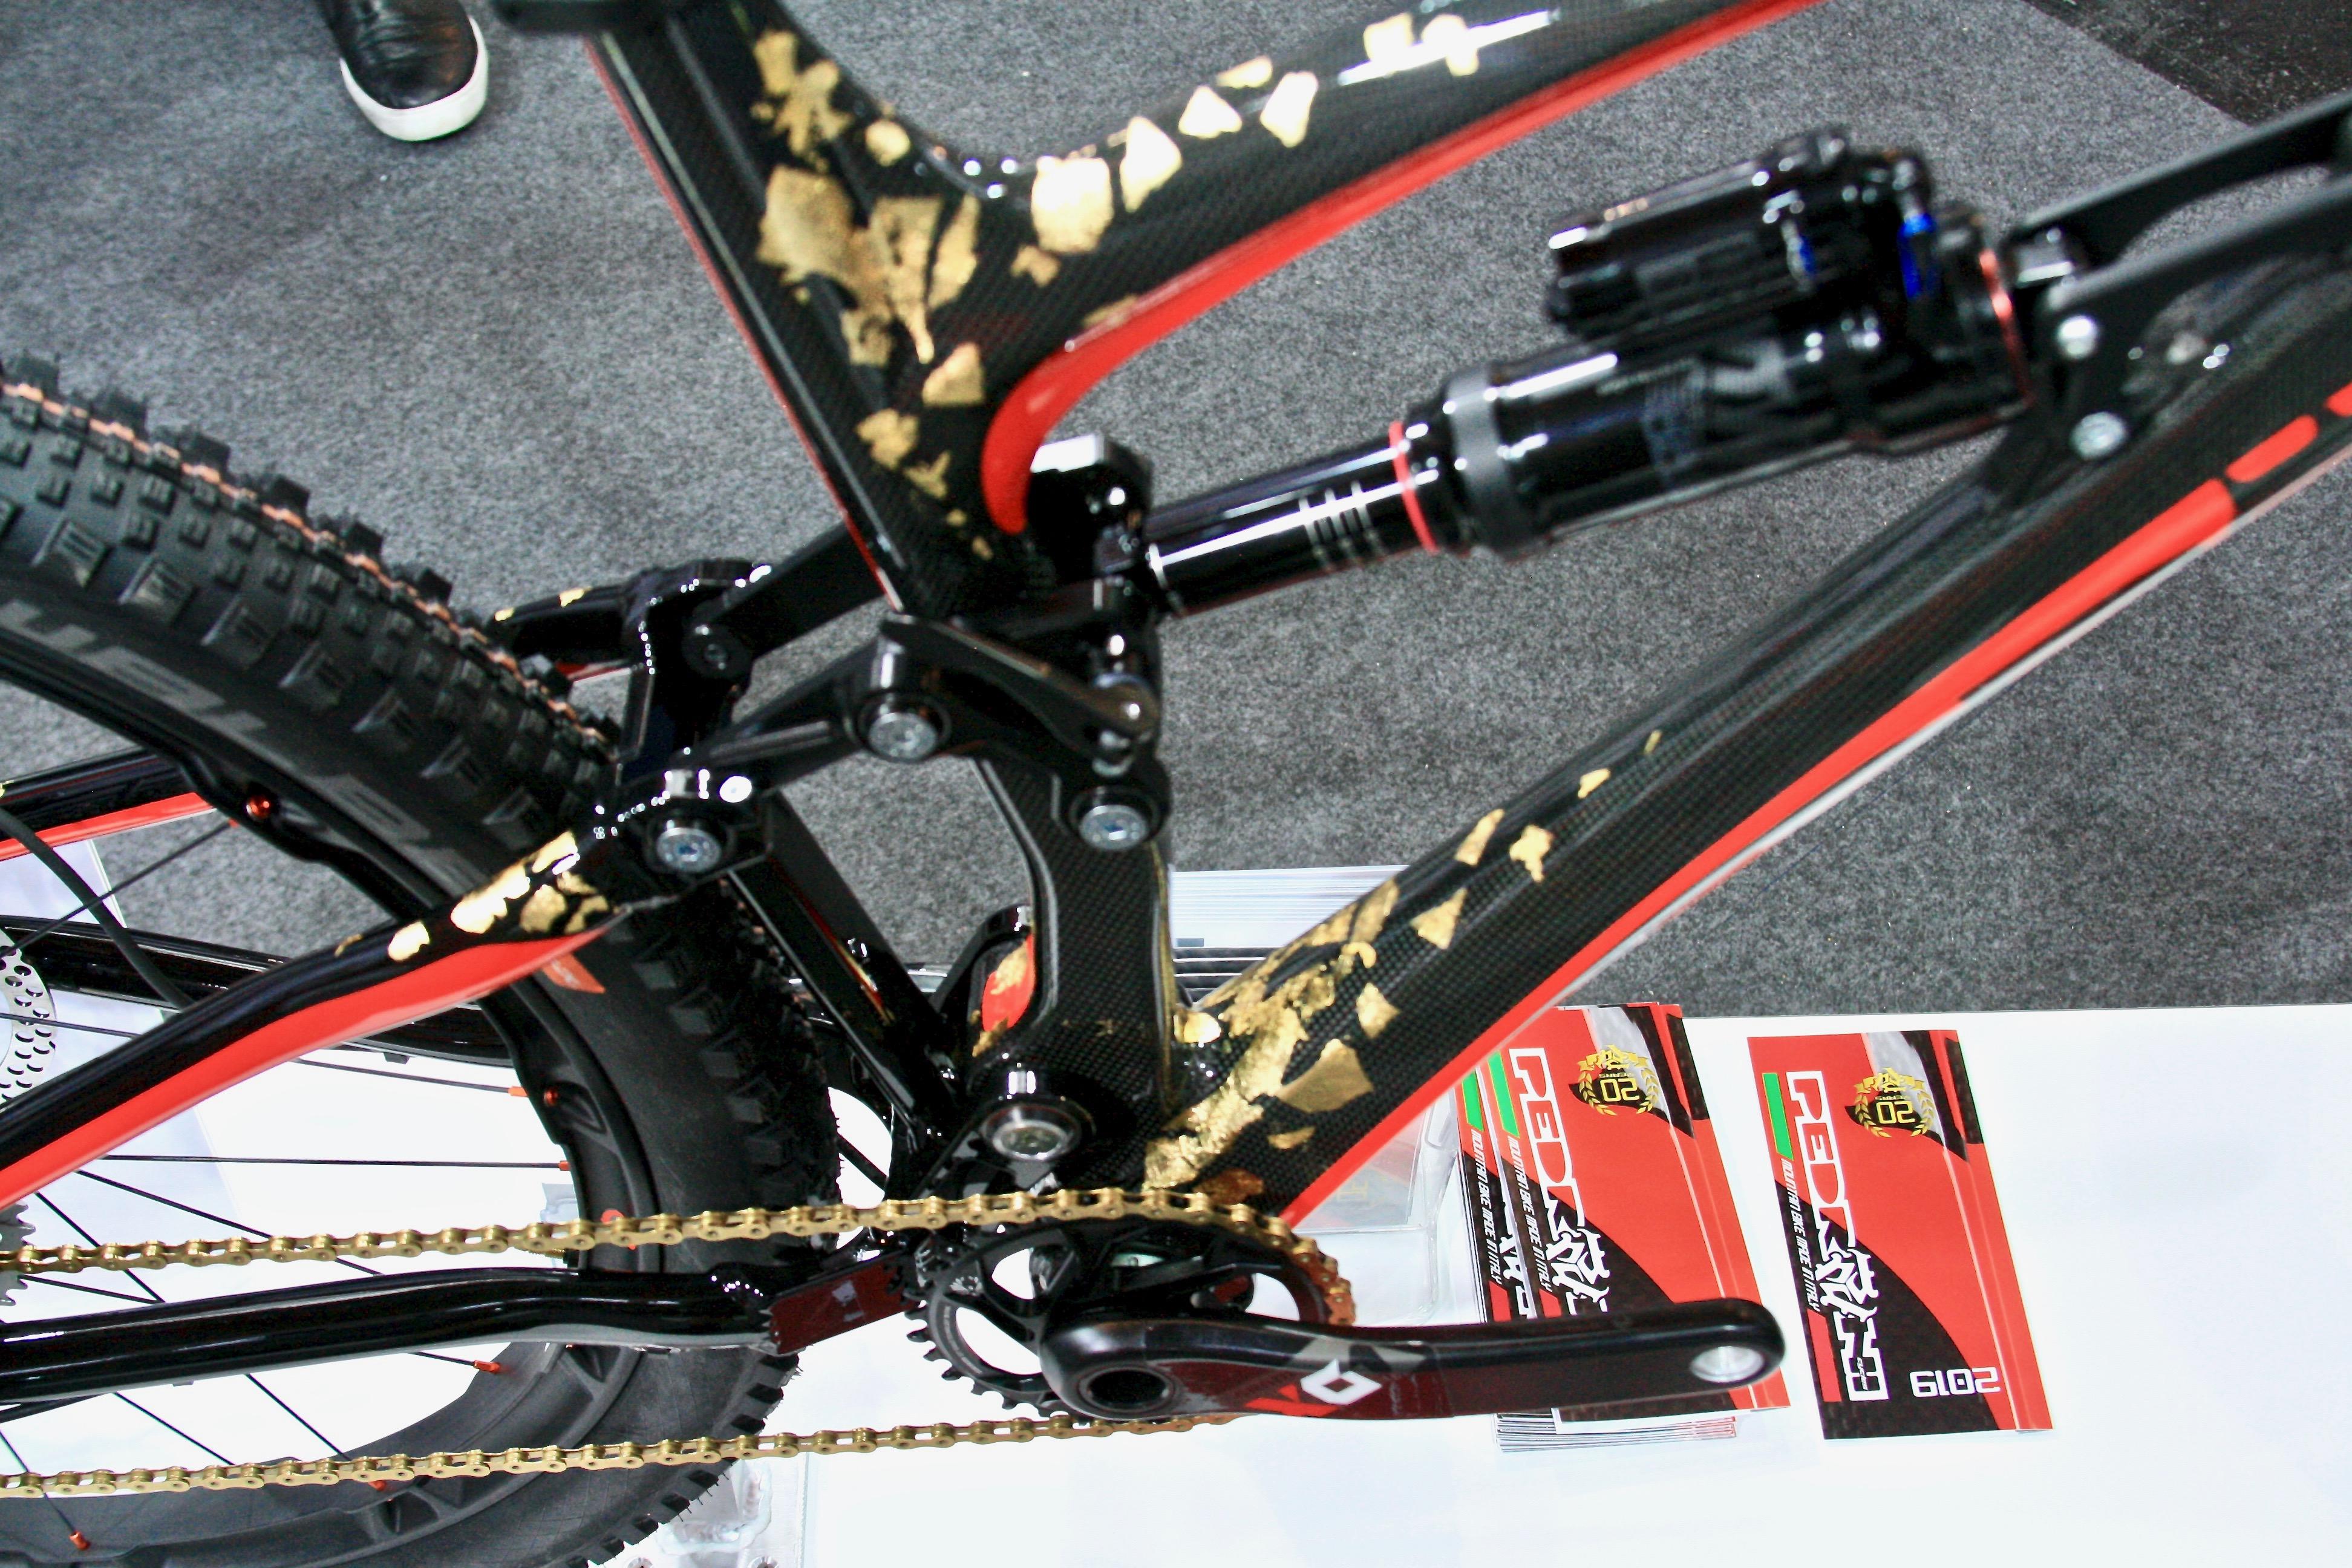 3f9fddd47a0 A Gold Leaf Covered Italian Enduro Bike from Pedroni Cycles - Singletracks  Mountain Bike News